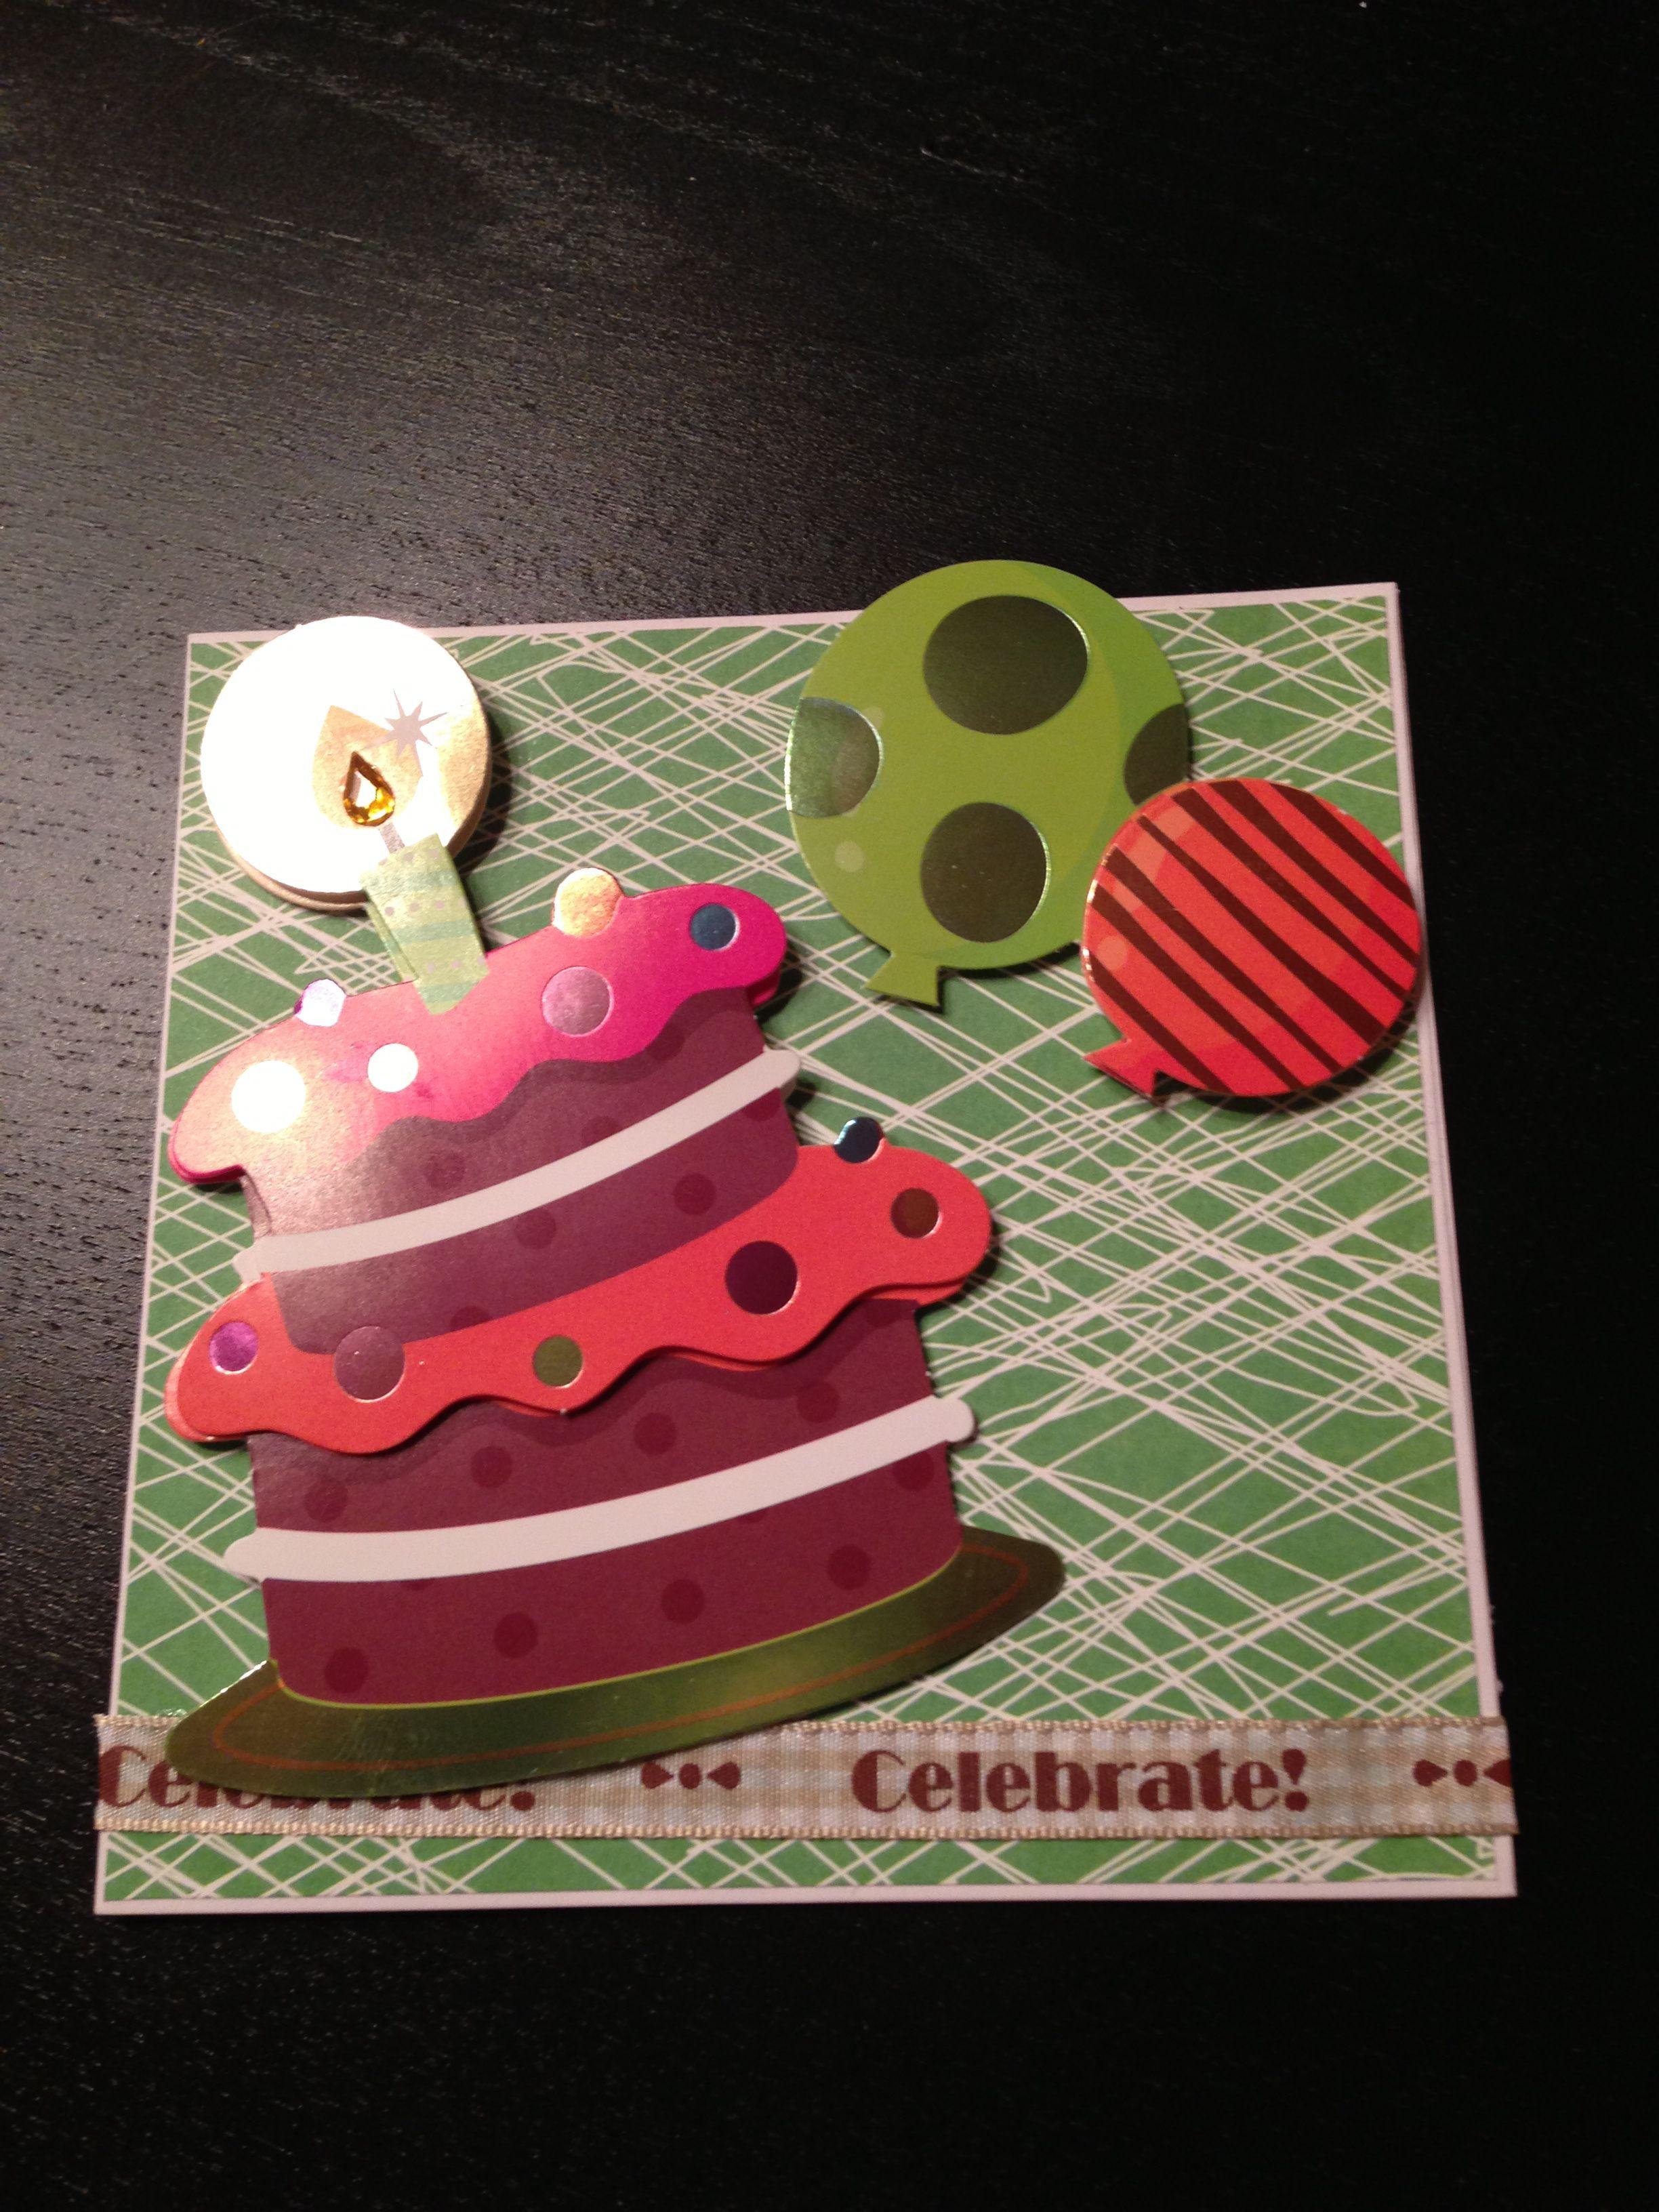 Happy birthday handmade greeting card by sweetest handz cards